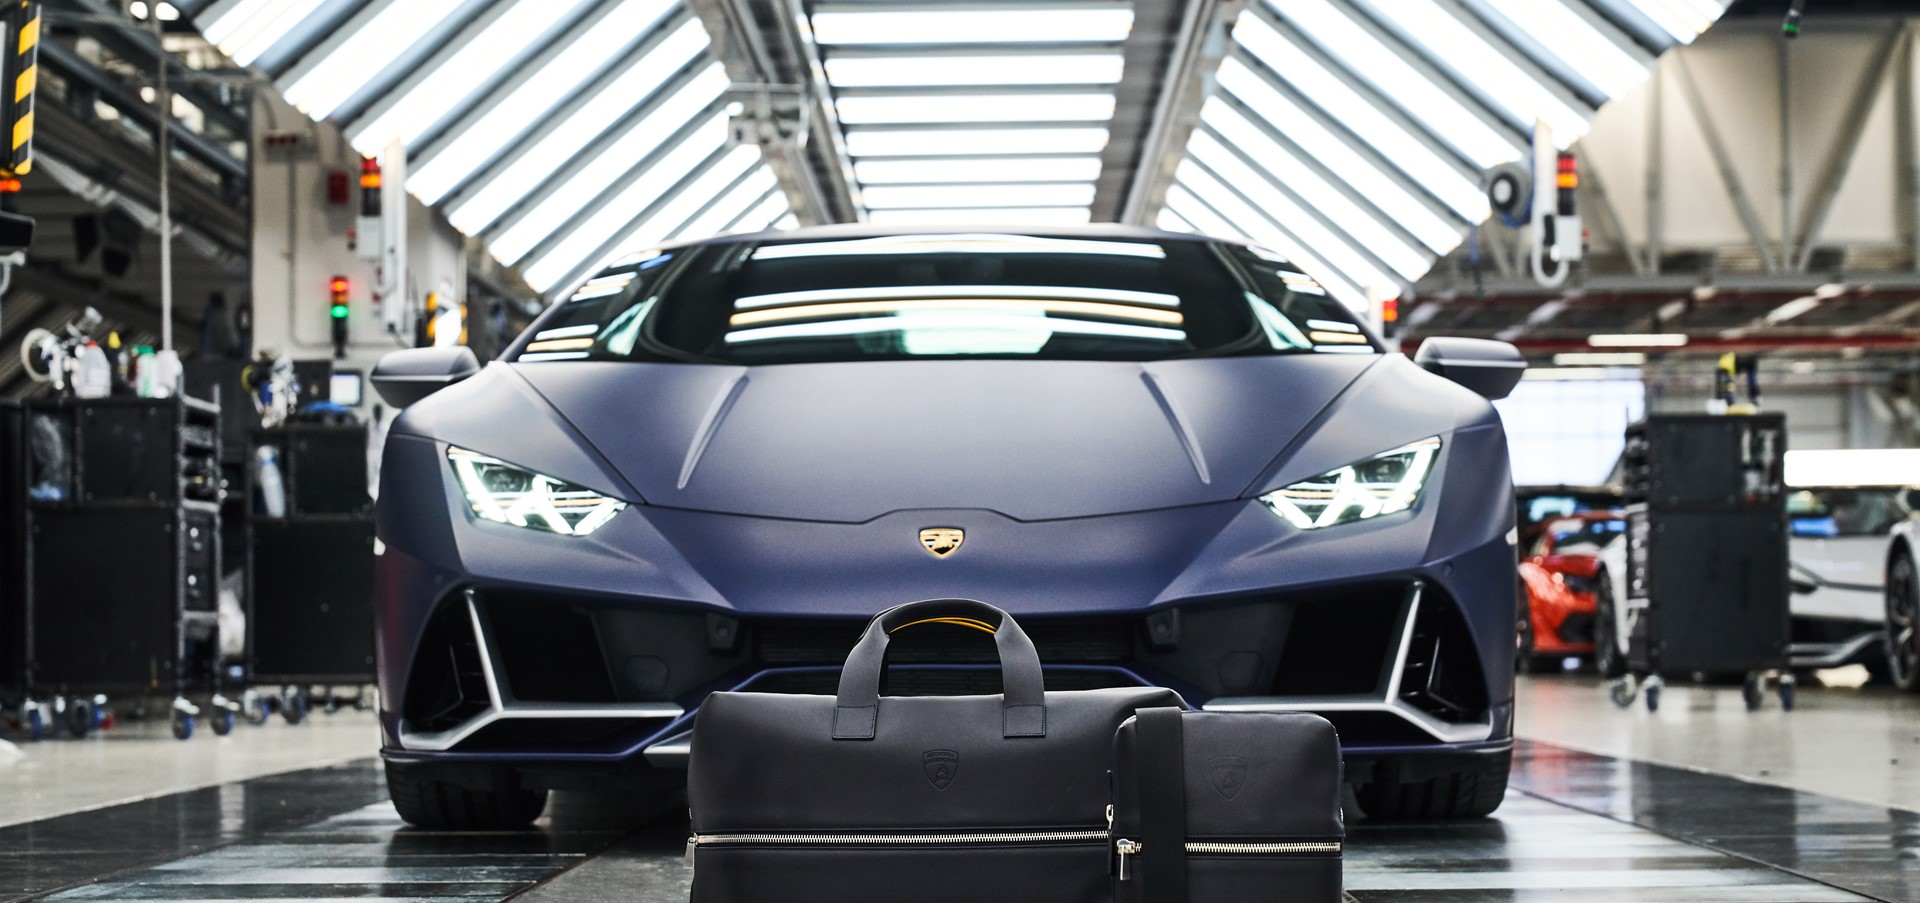 Automobili Lamborghini and Principe: licensing agreement..